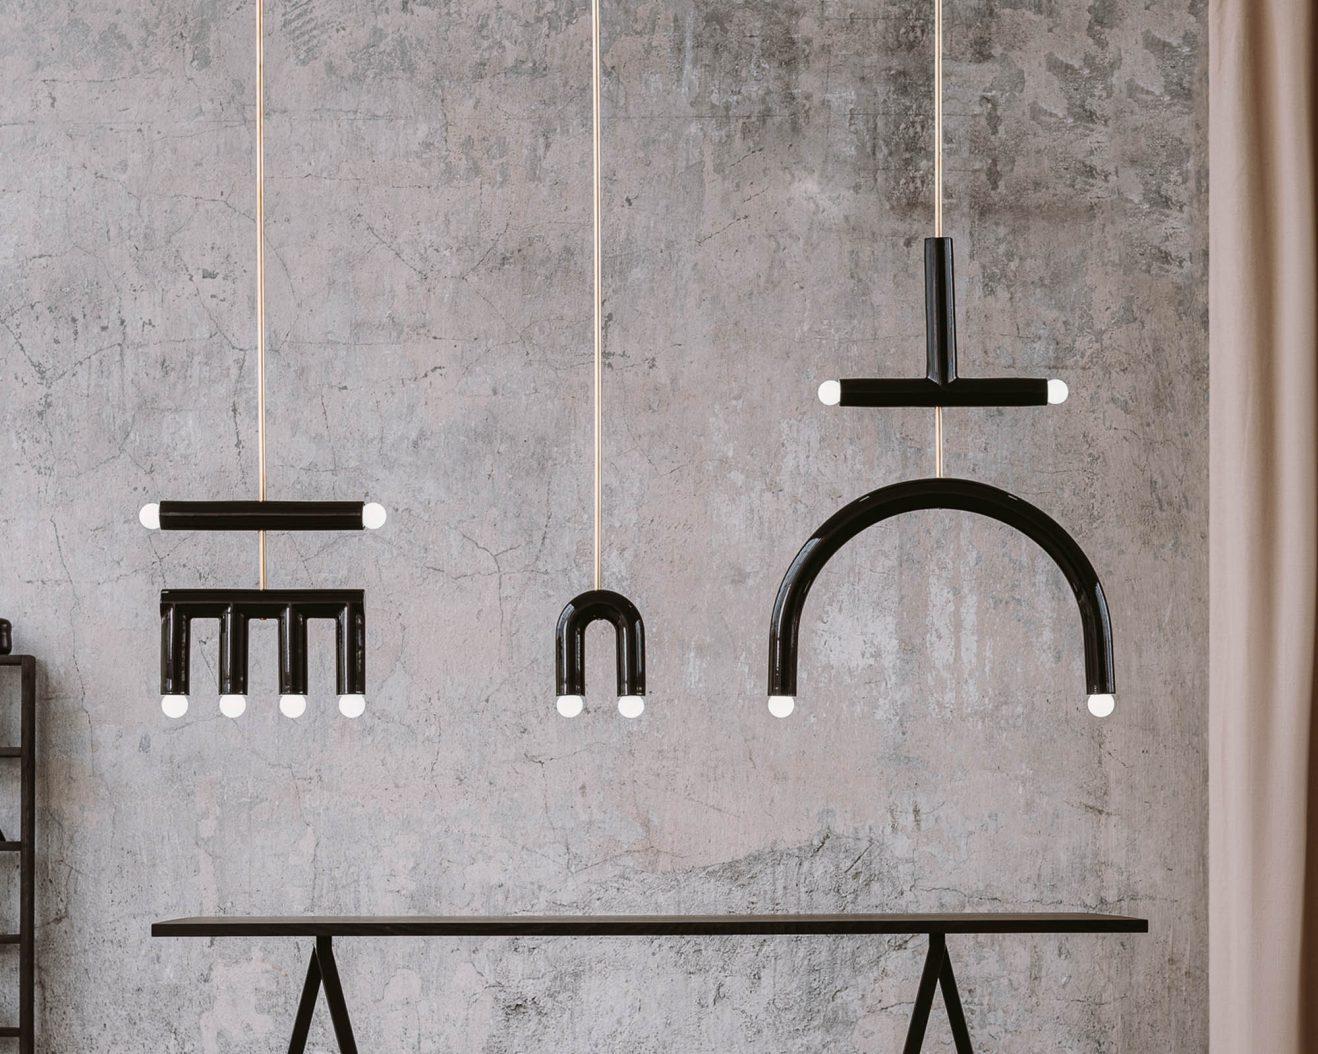 Pani-Jurek-Pendant-Lamp-3-bis